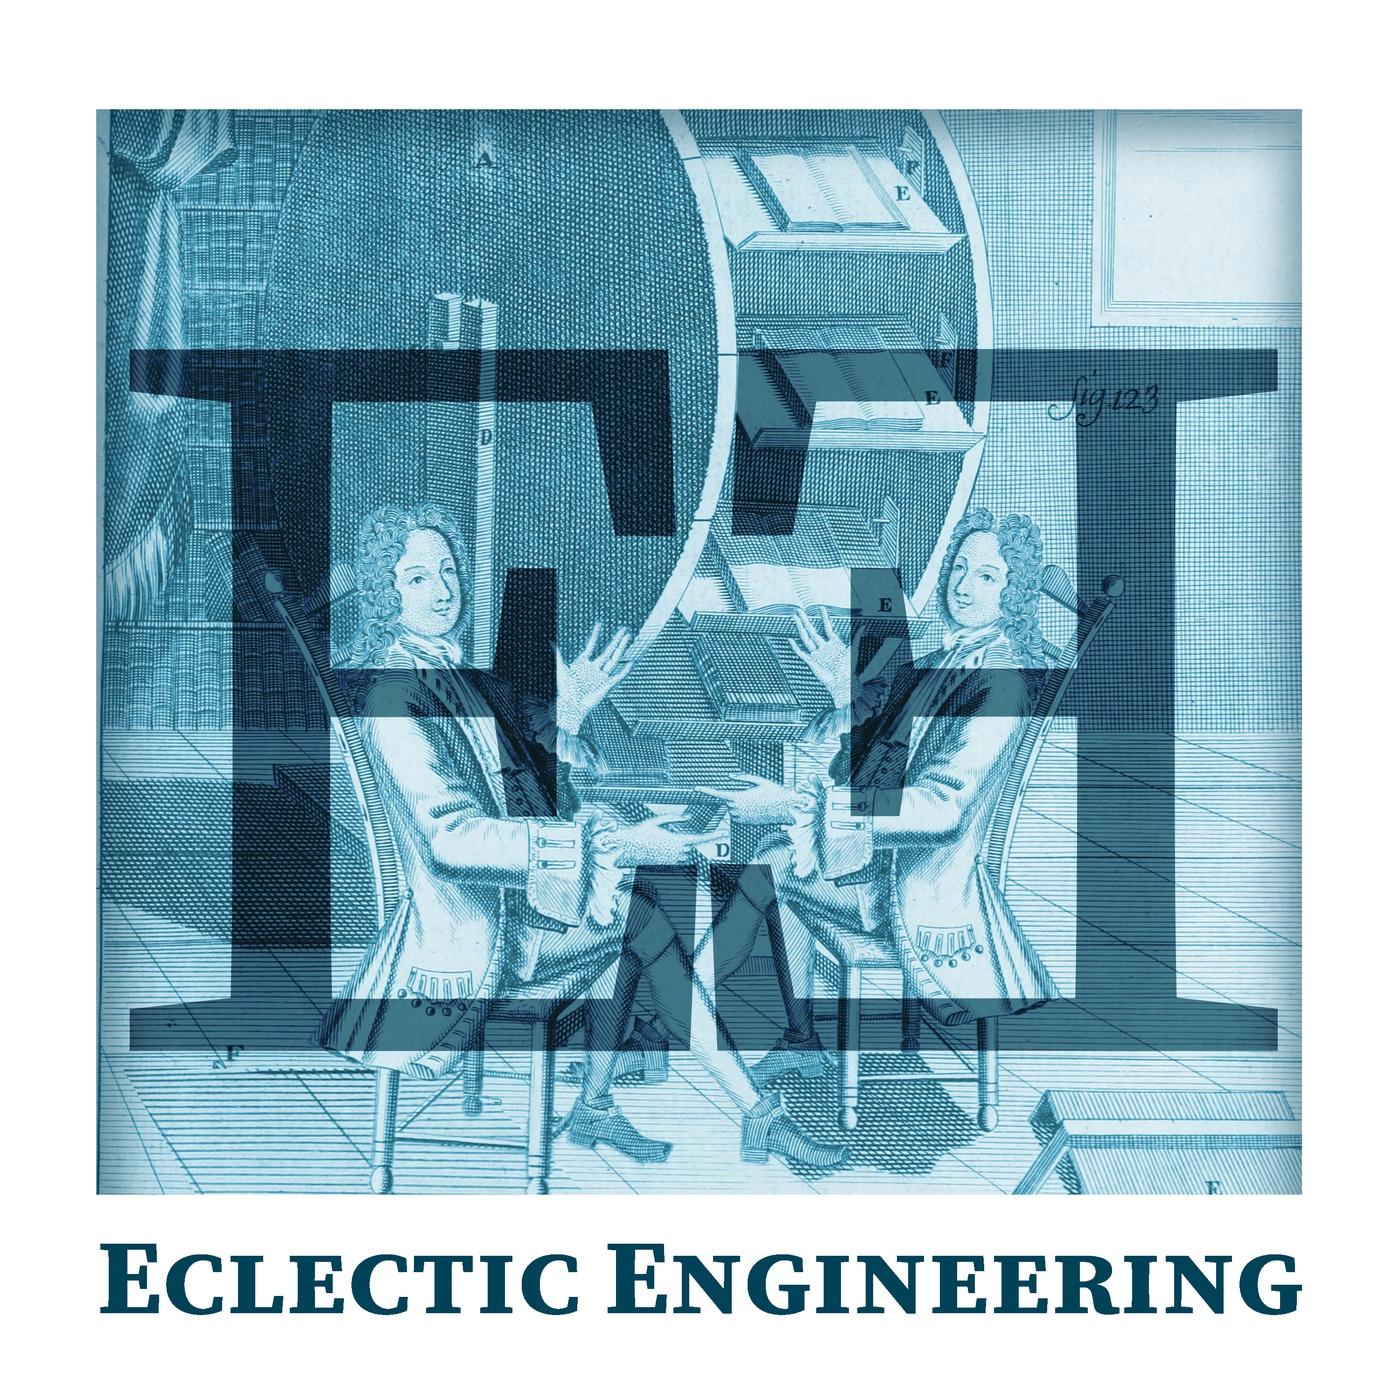 Eclectic Engineering